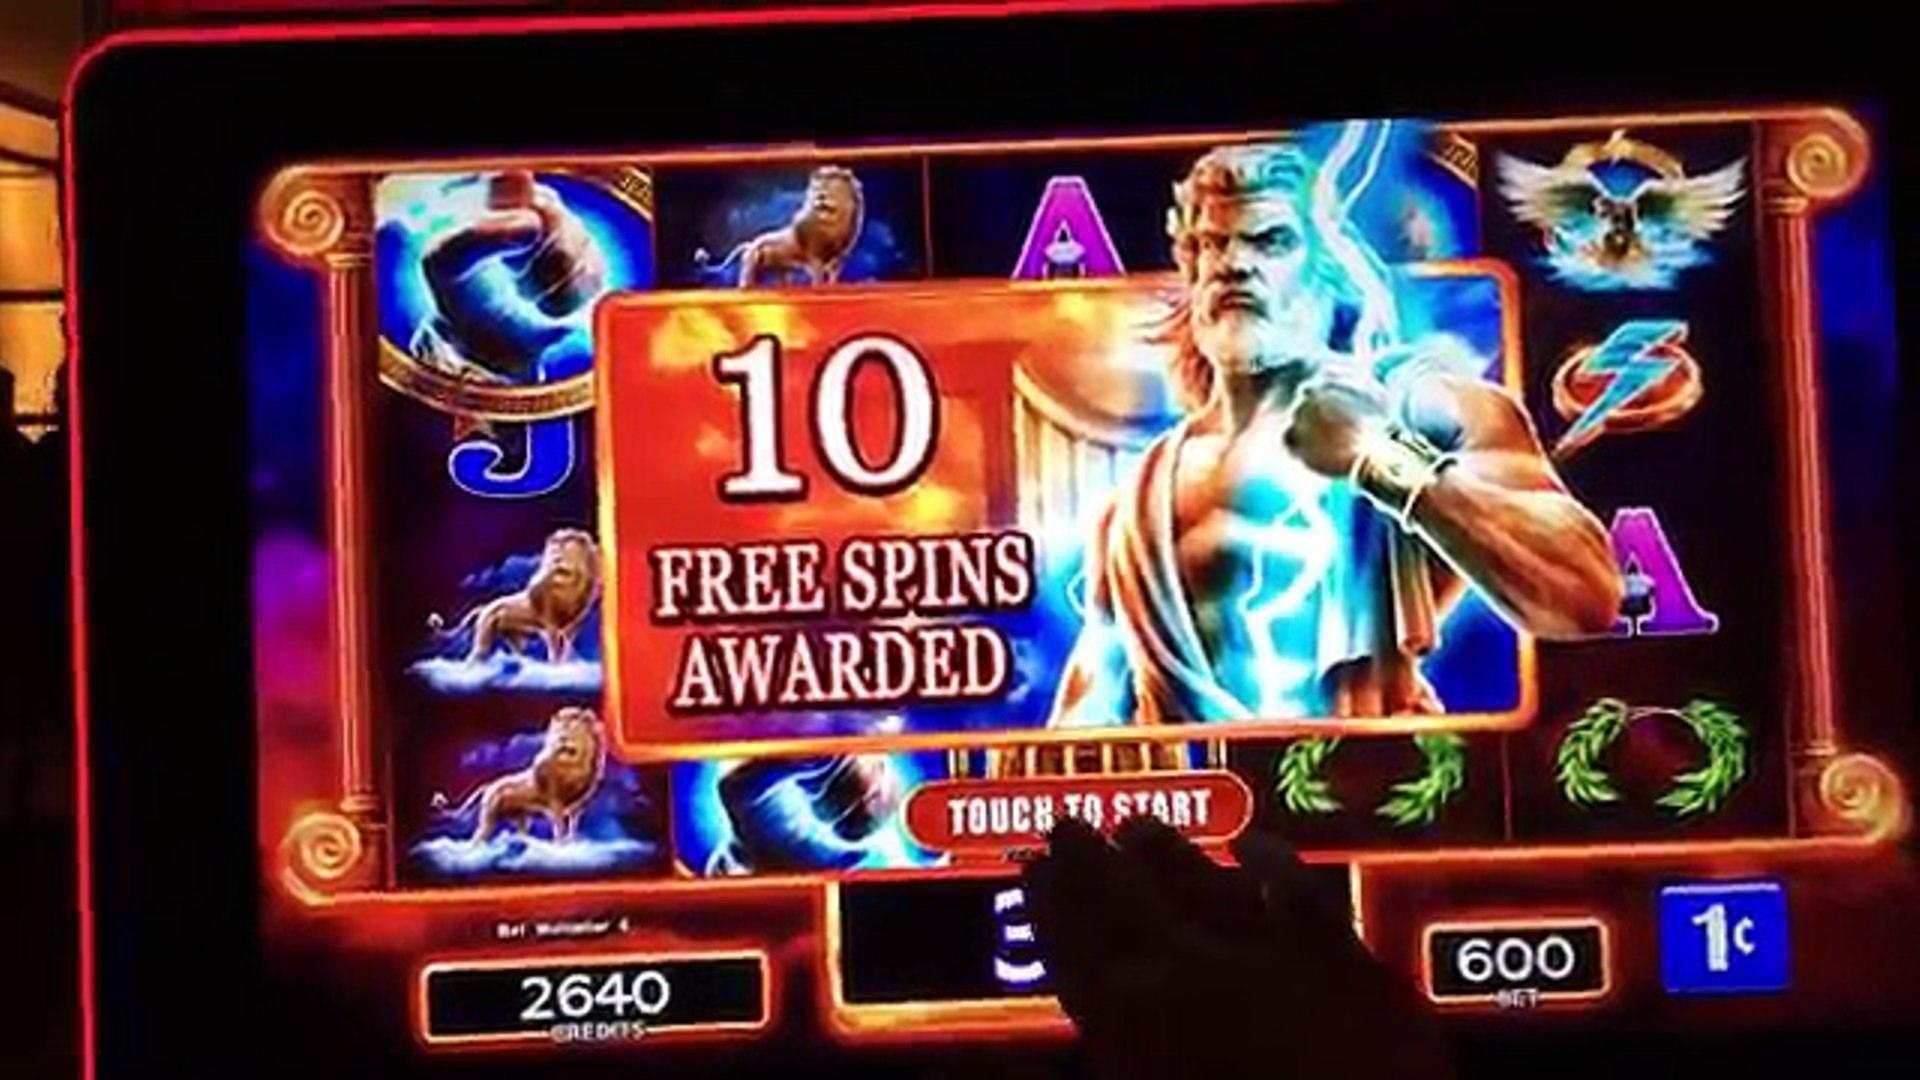 760% Zápas v kasíne v Casino King